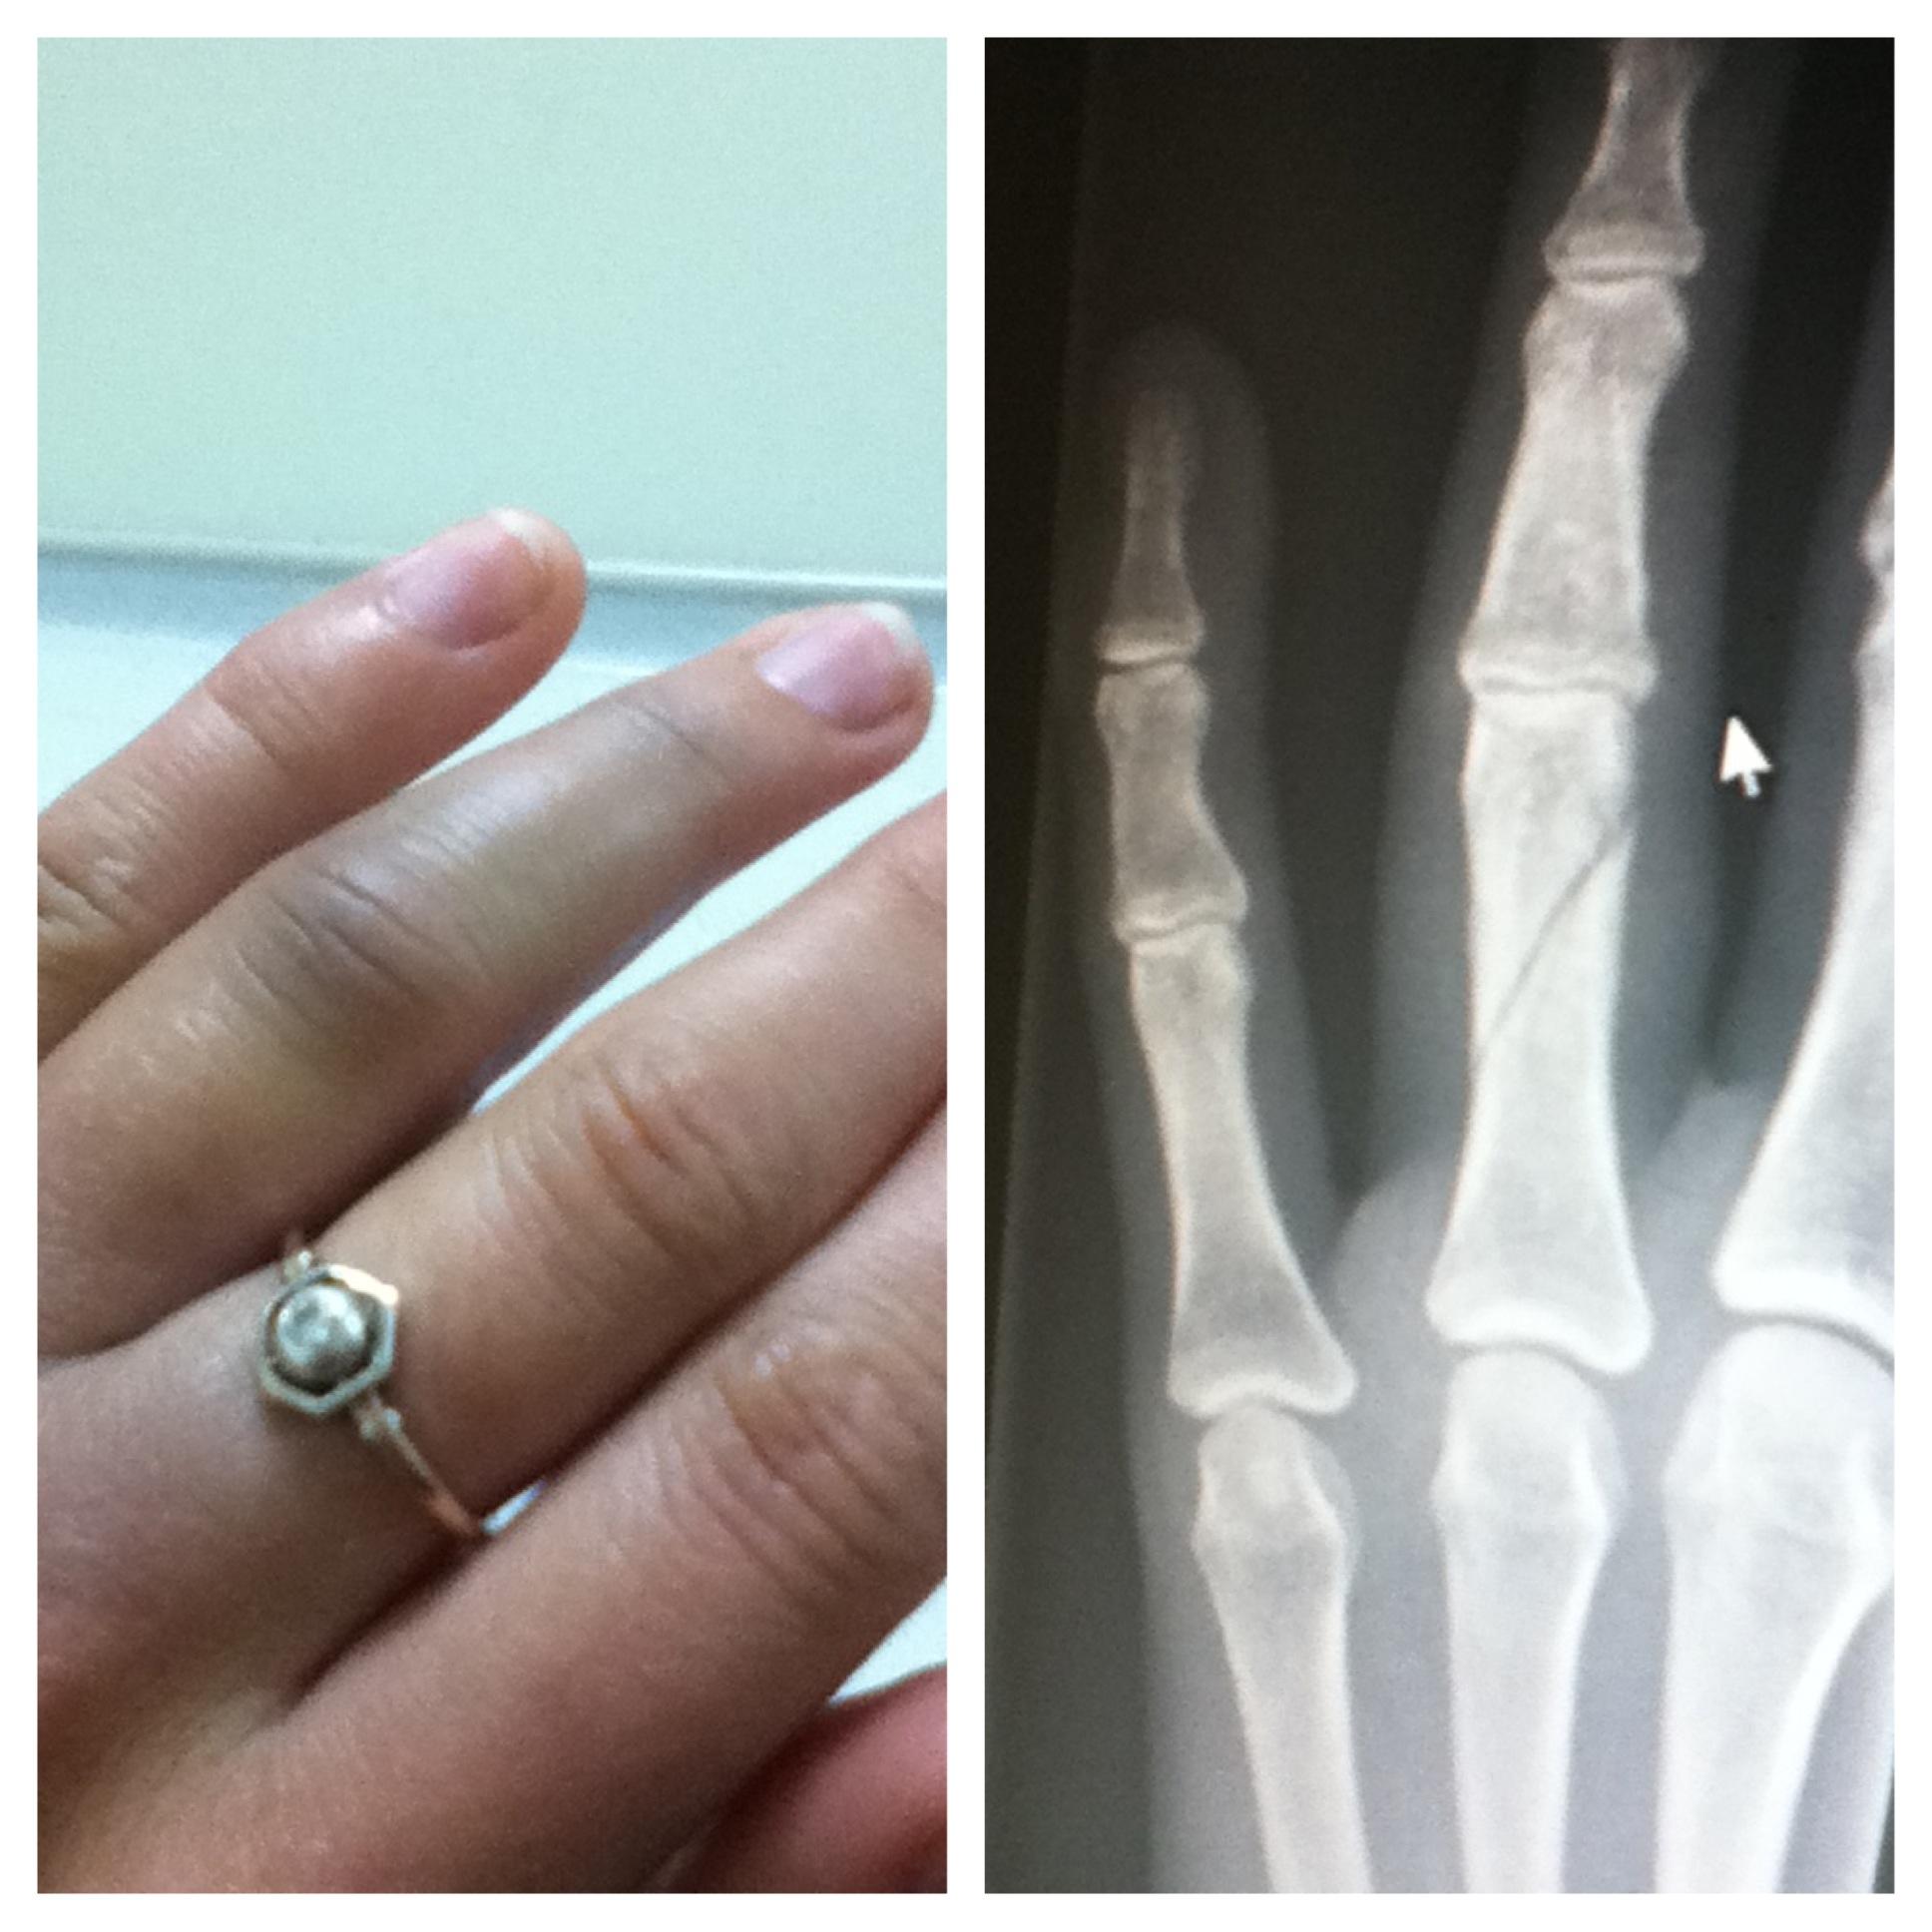 mayaogorzalek broken finger